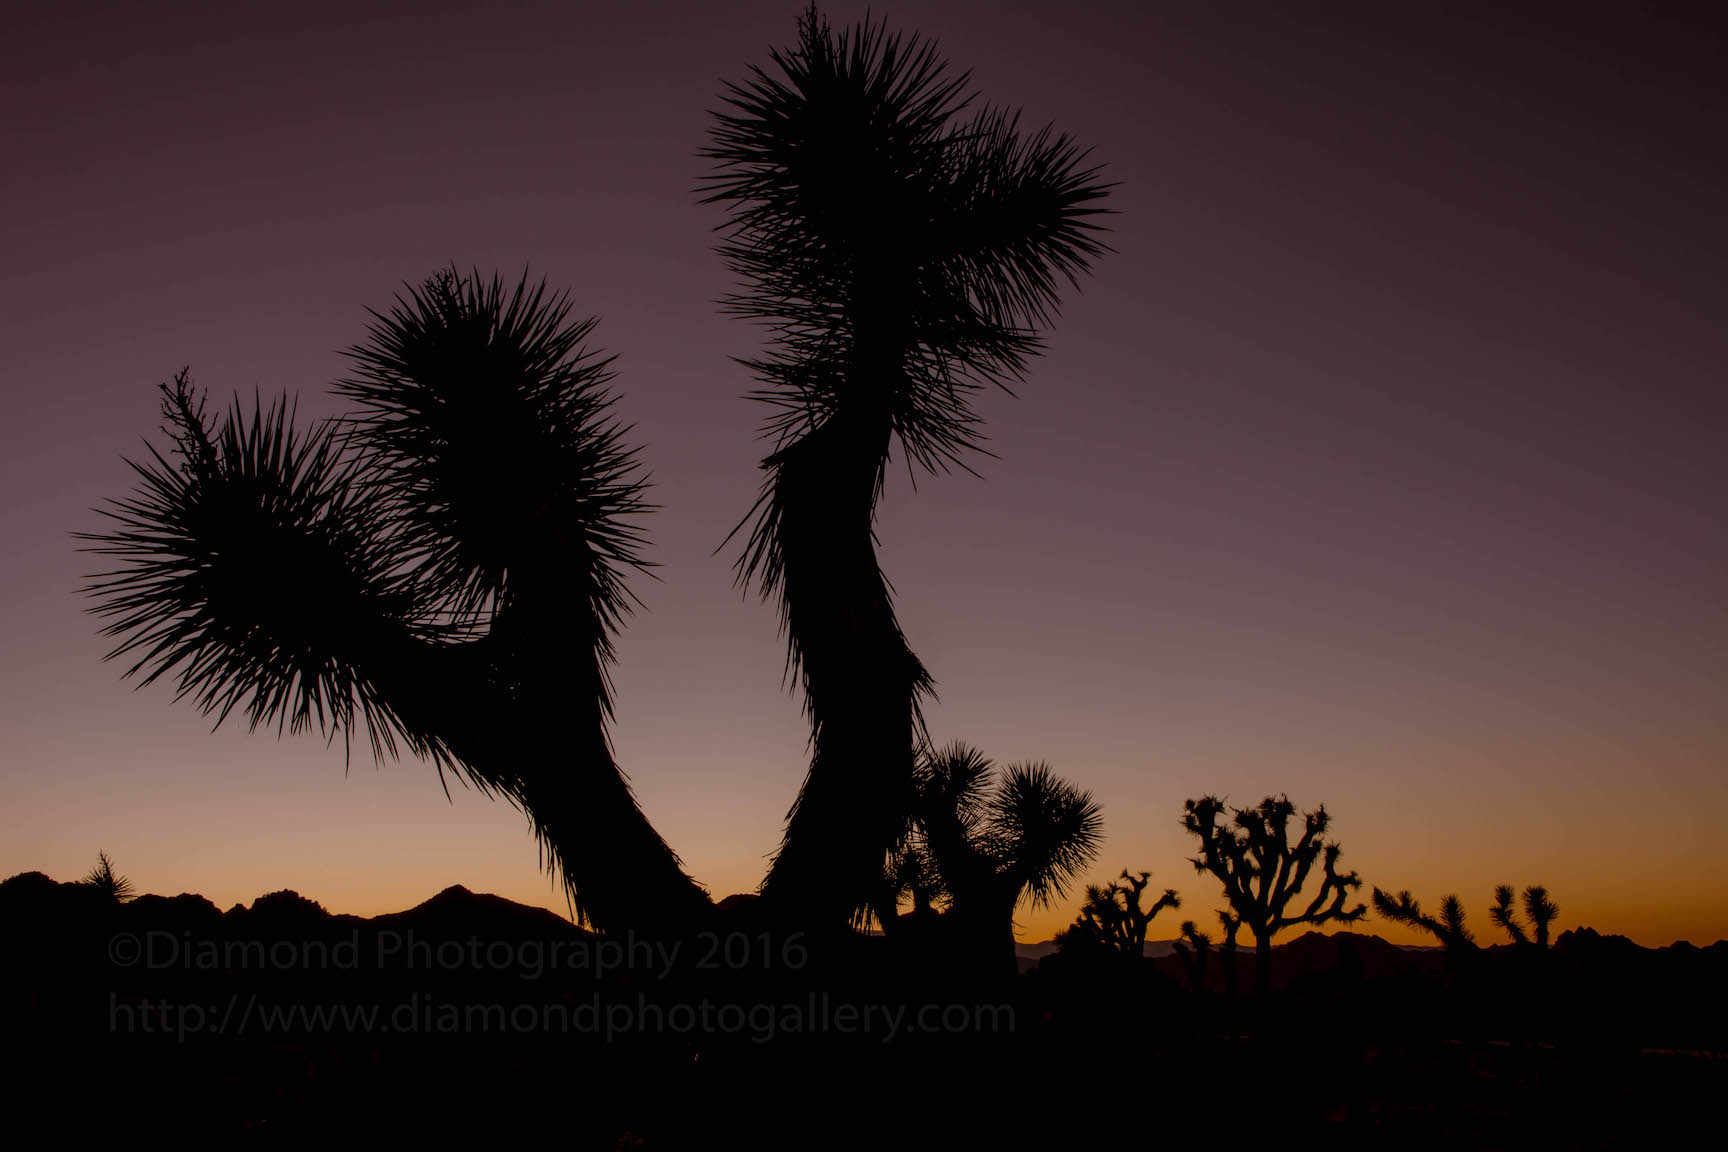 Photographing Joshua Tree National Park full moon